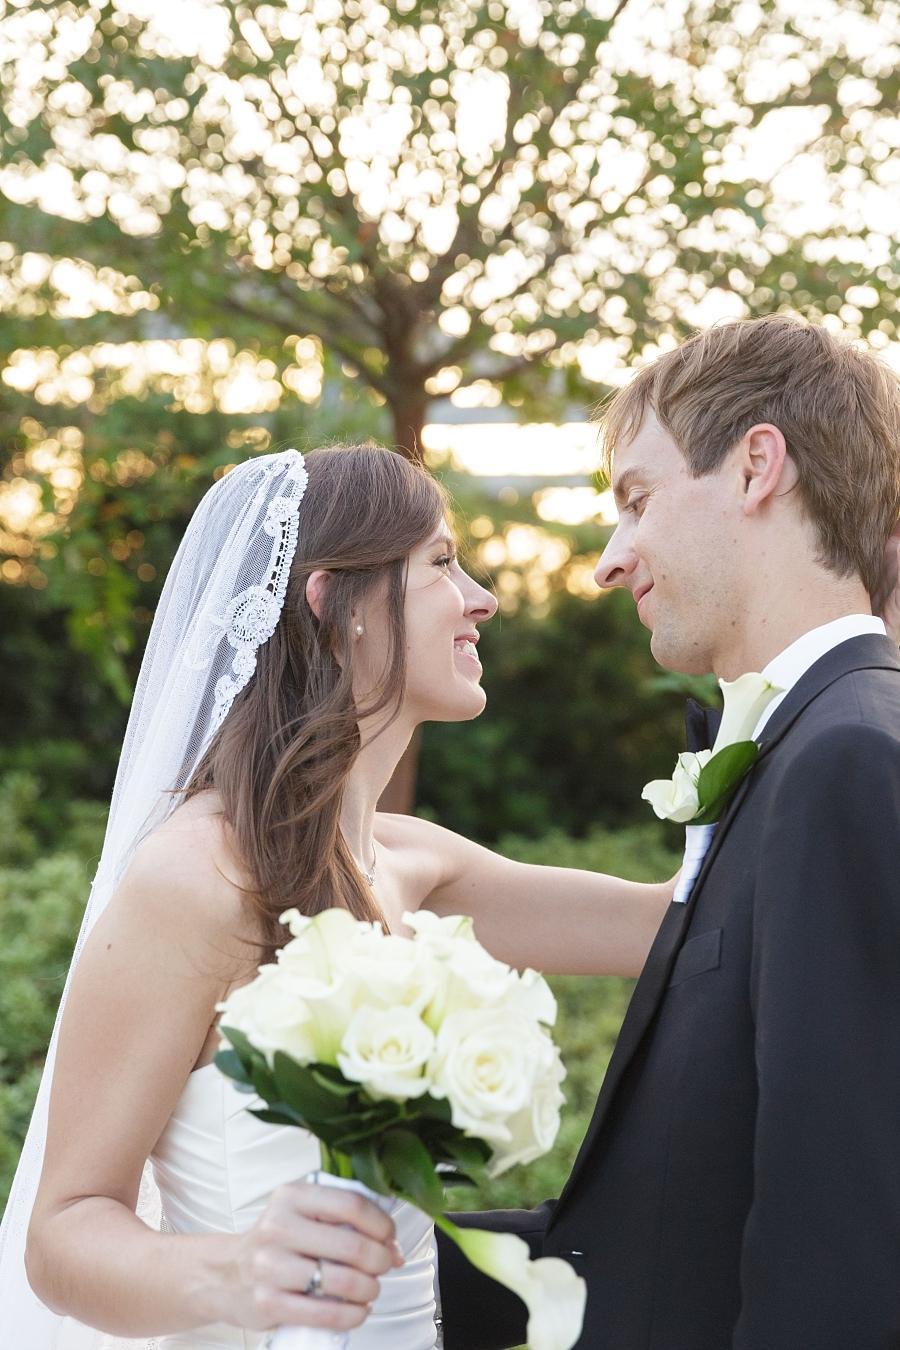 Stacy-Anderson-Photography-McGovern-Centennial-Gardens-Houston-Wedding-Photographer_0065.jpg